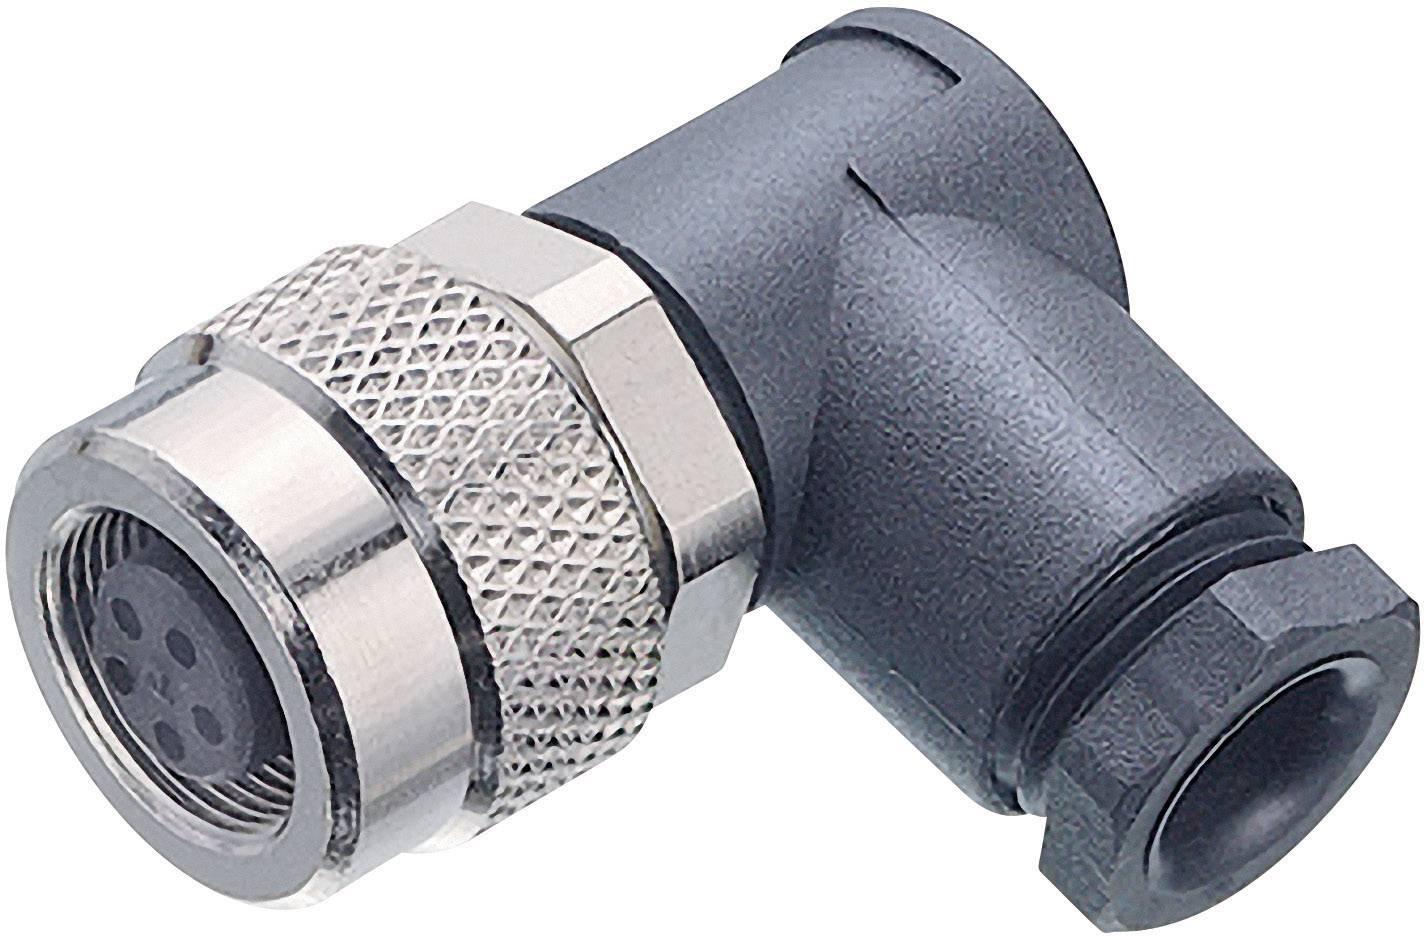 Guľatý konektor submin. Binder 99-0406-70-03, 3-pól., uhlová zásuvka, 3,5 - 5 mm, IP67